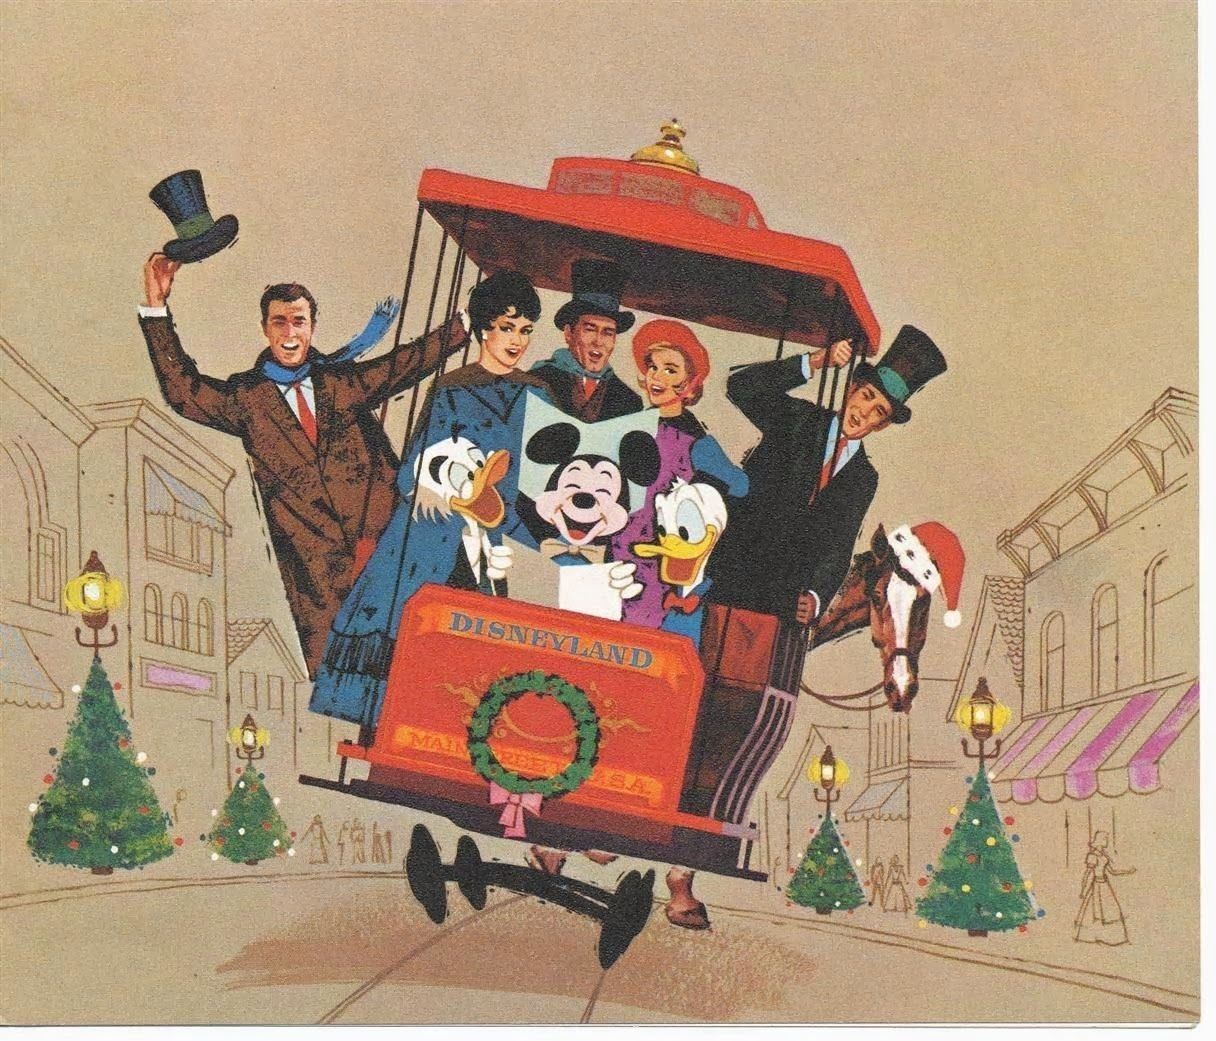 Merry Christmas From Disneyland